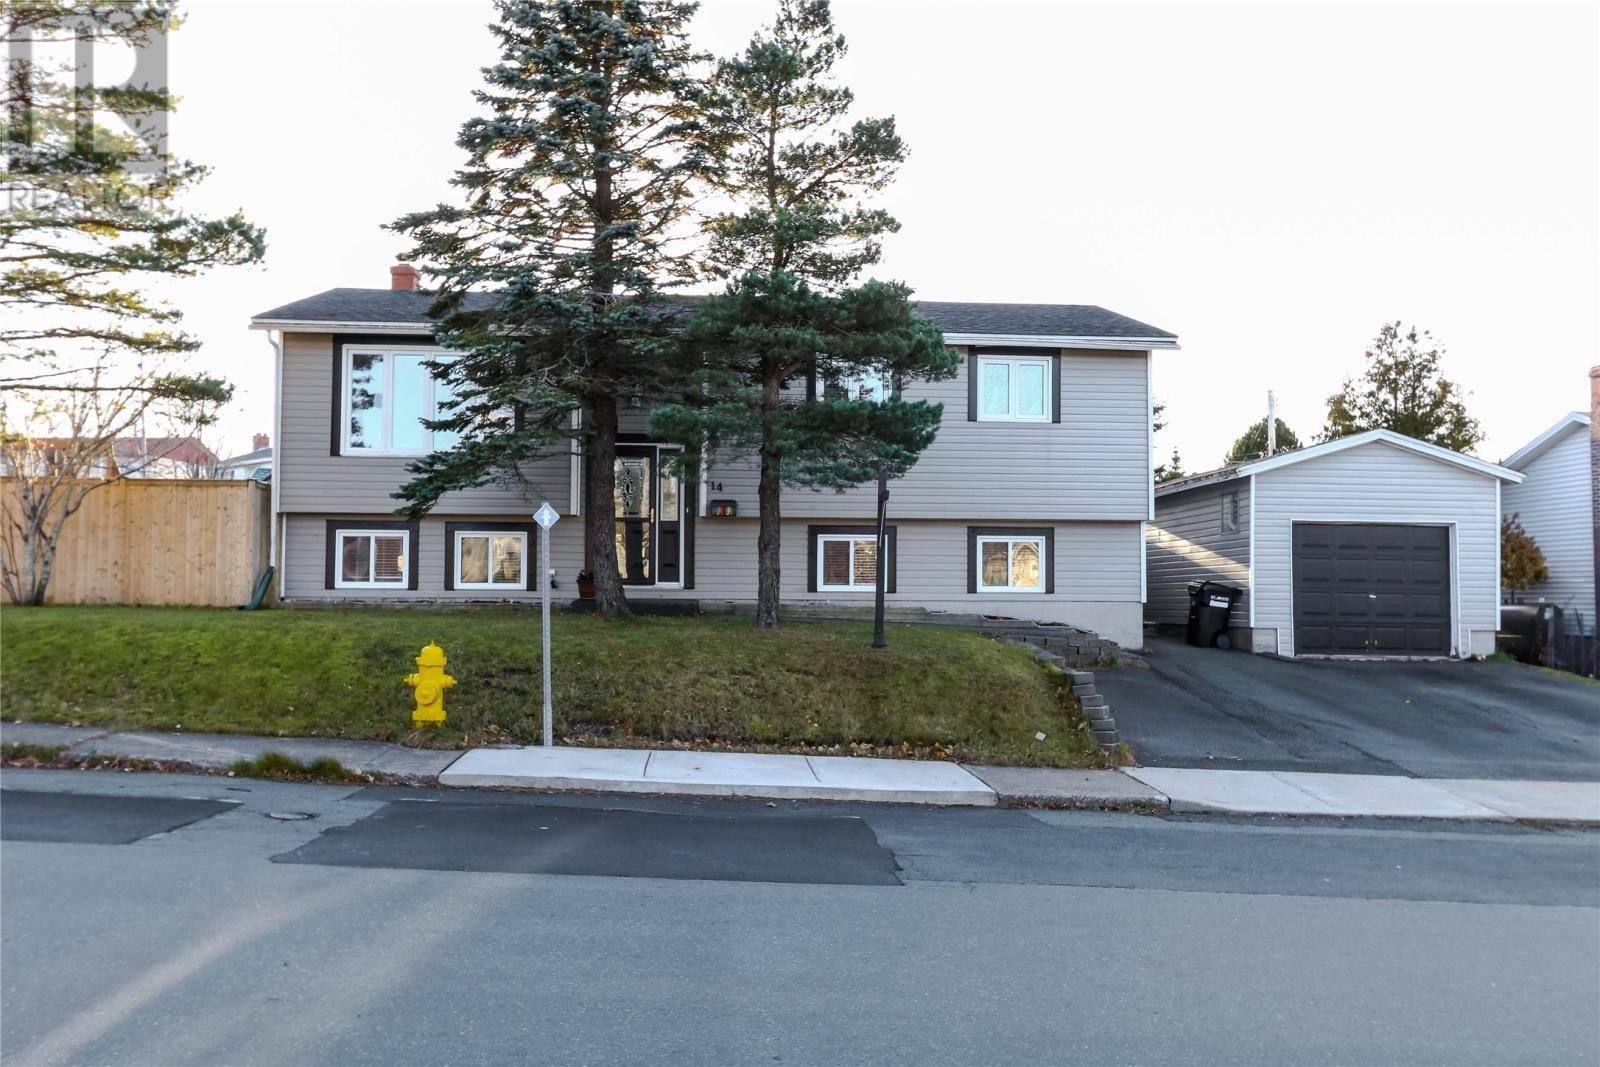 House for sale at 14 Grieve St St. John's Newfoundland - MLS: 1207300